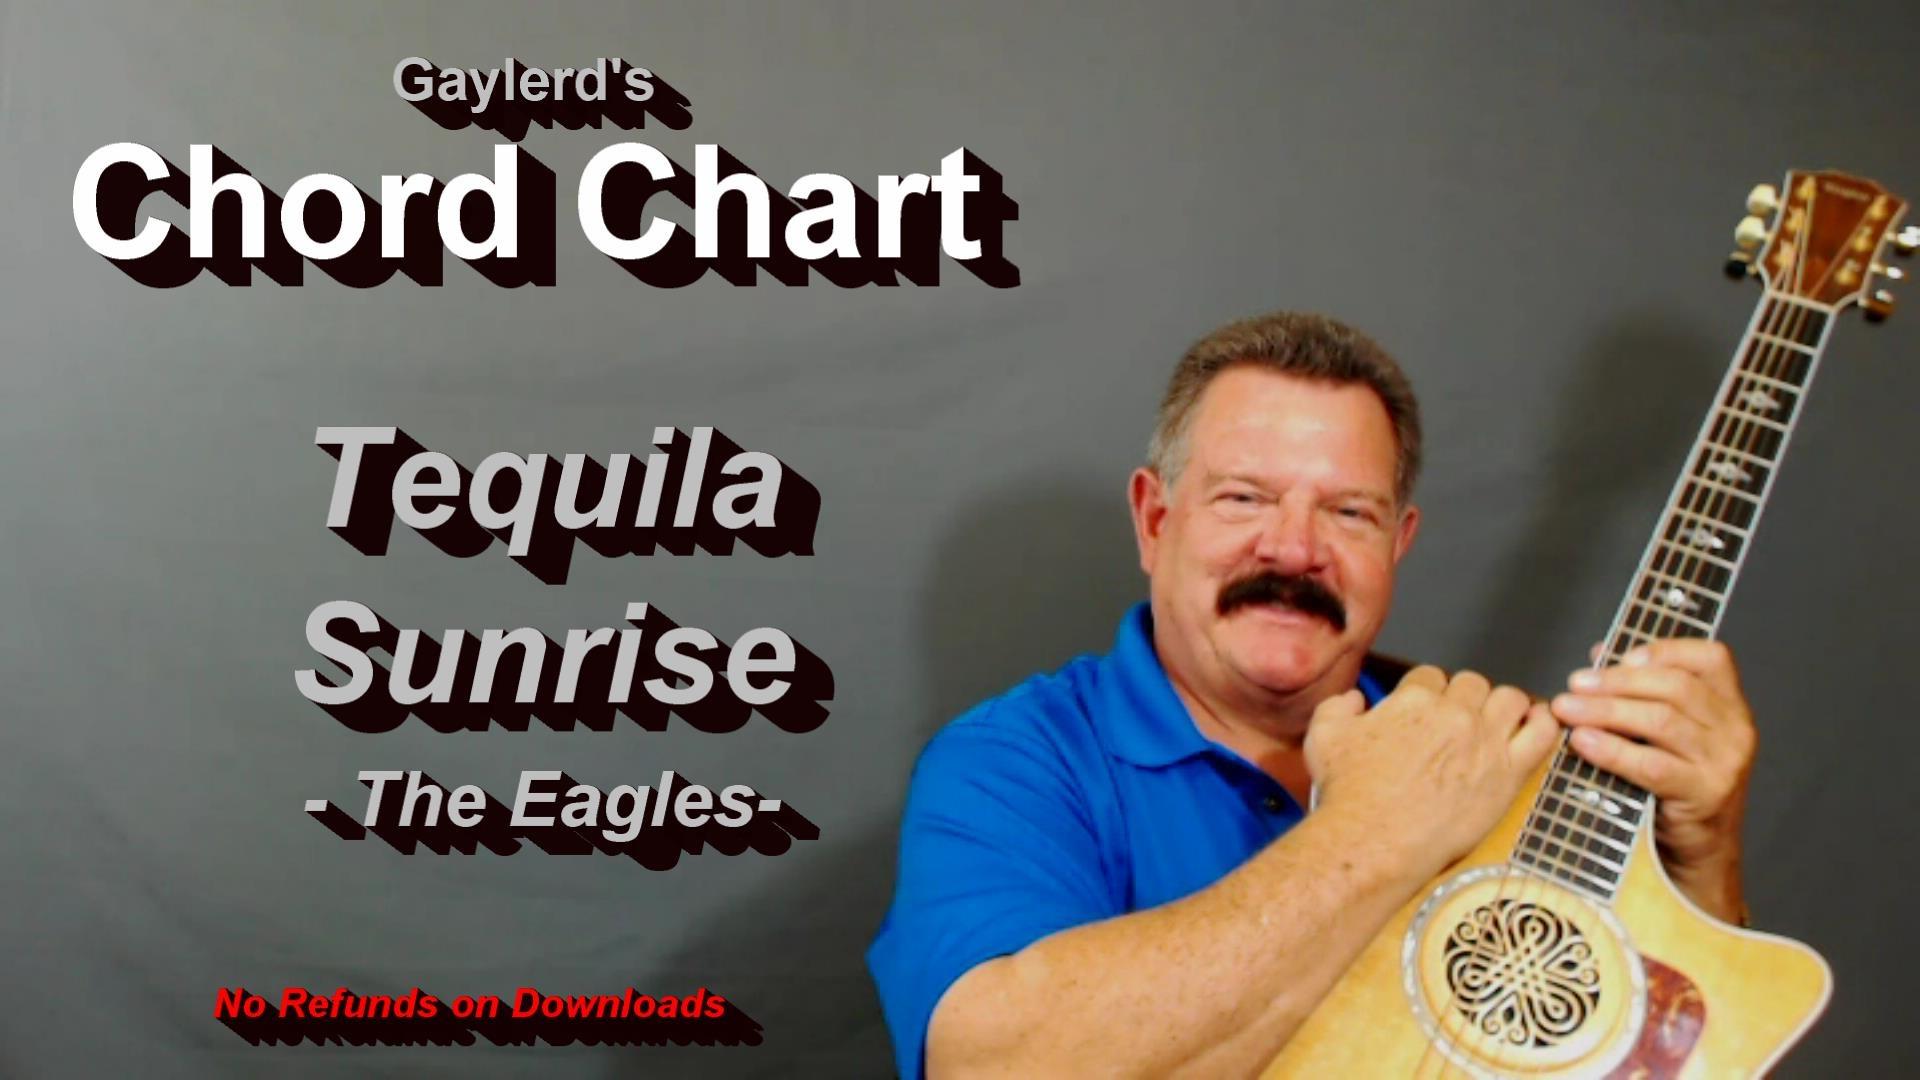 Tequila Sunrise   Chord Chart   GaylerdGUITAR